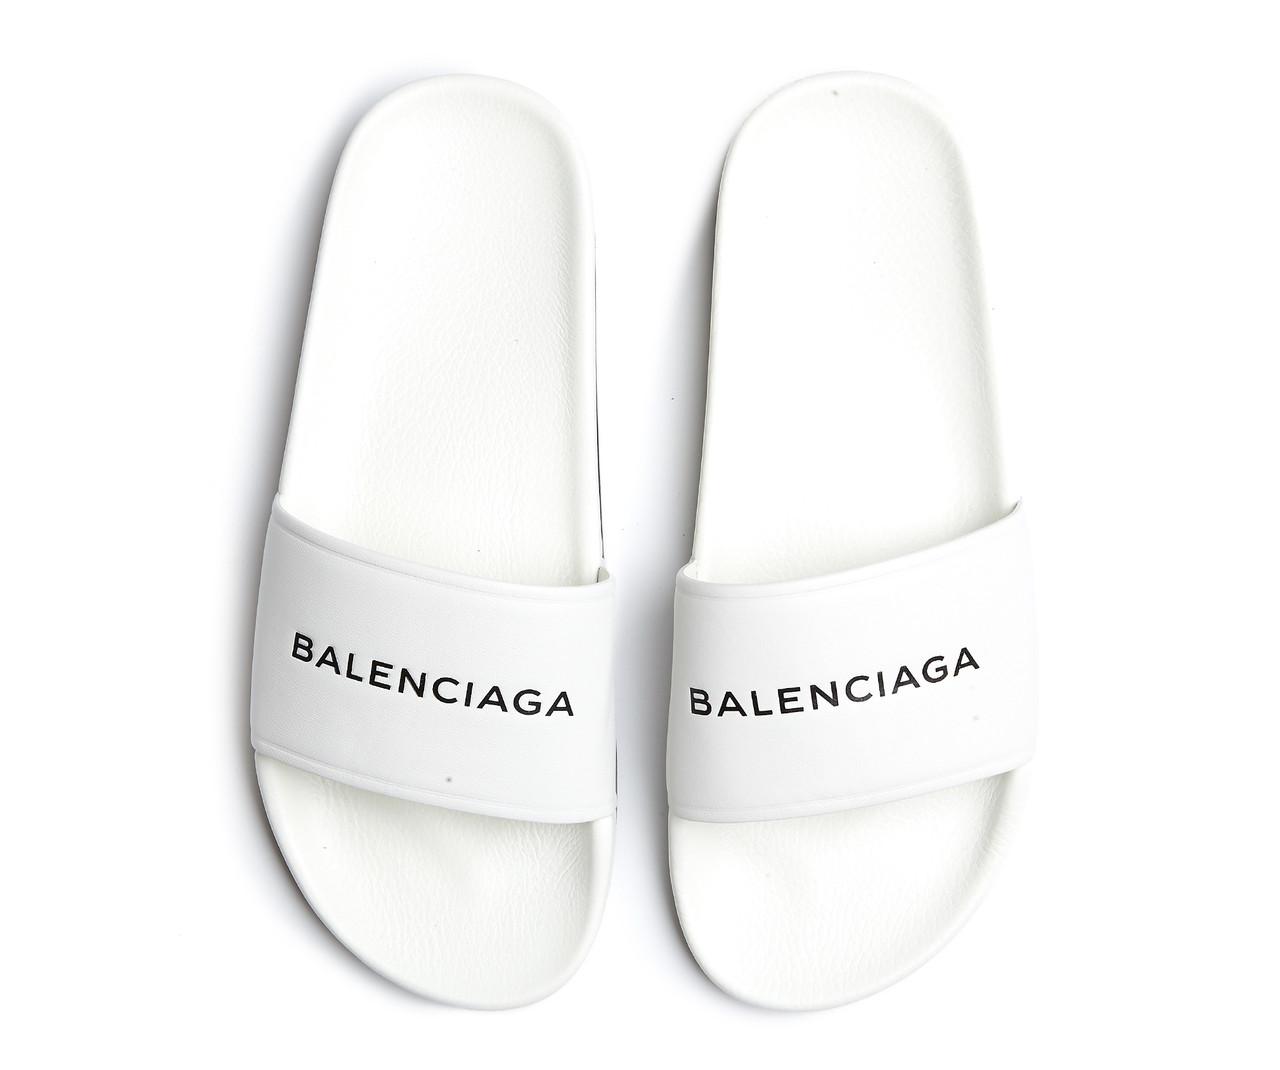 227b2055 Женские шлепанцы, сланцы Balenciaga Slippers White (Баленсиага, белые) -  Магазин обуви Brand